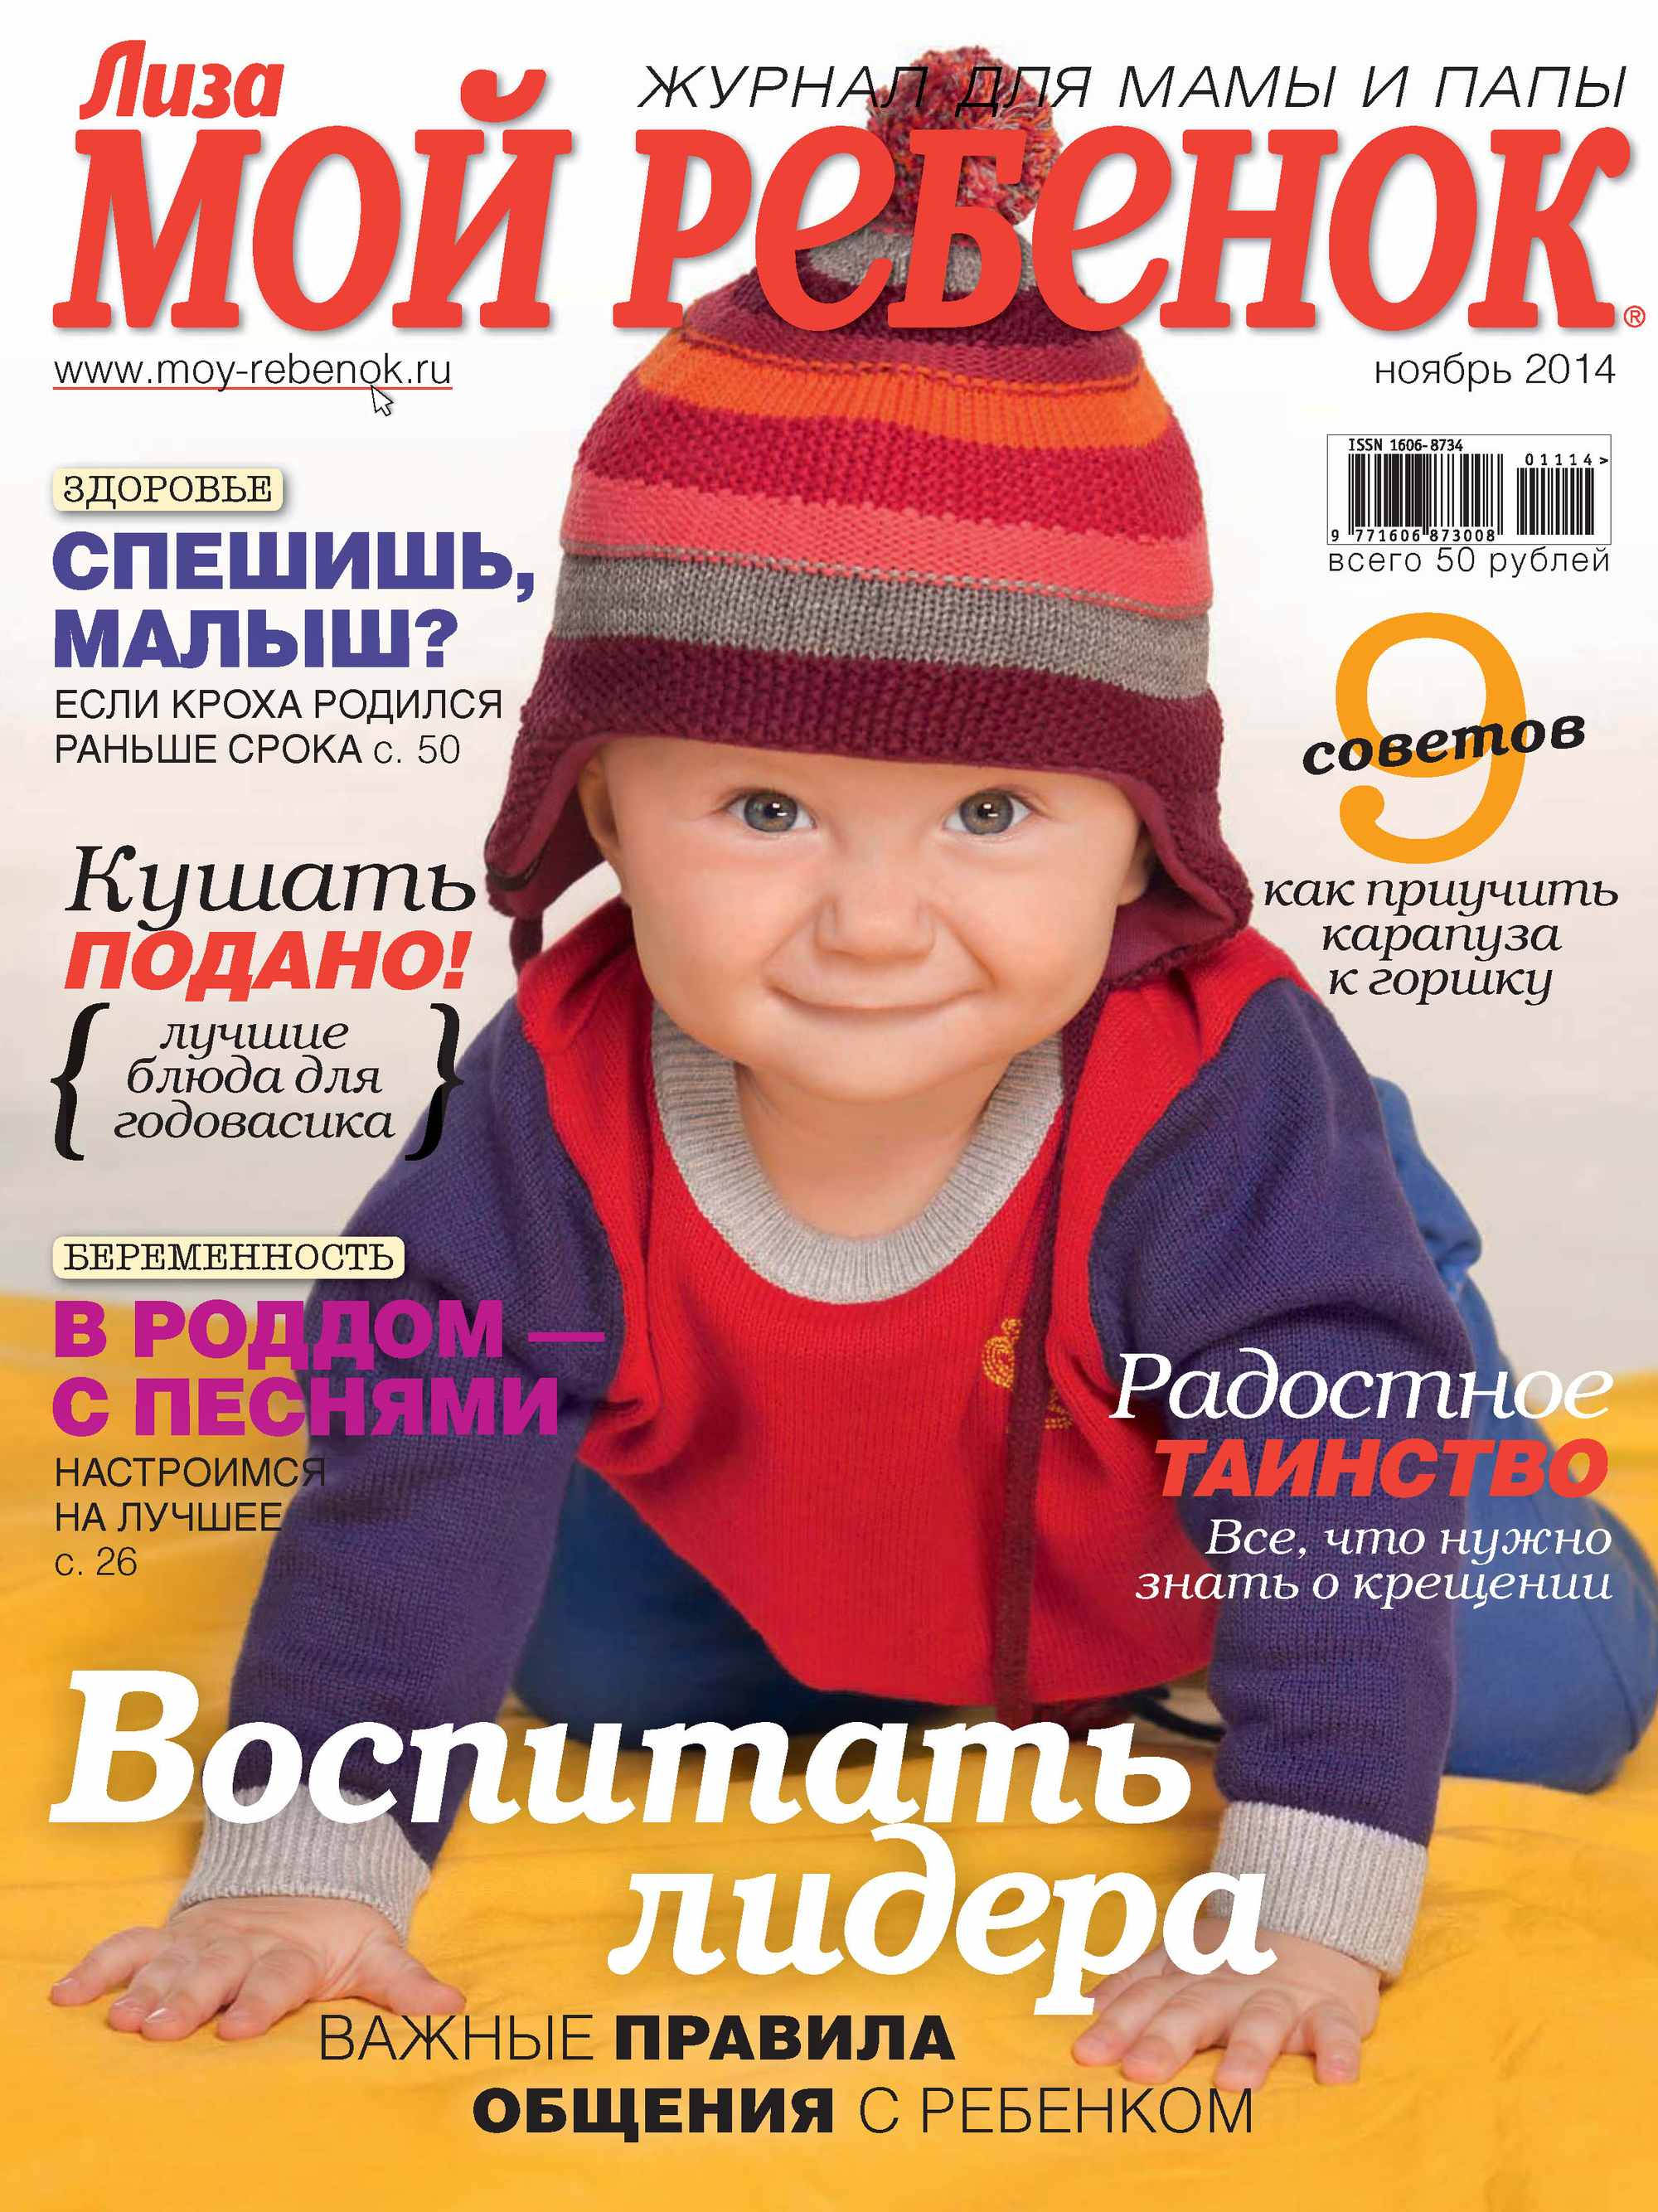 ИД «Бурда» Журнал «Лиза. Мой ребенок» №11/2014 ид бурда журнал лиза мой ребенок 11 2014